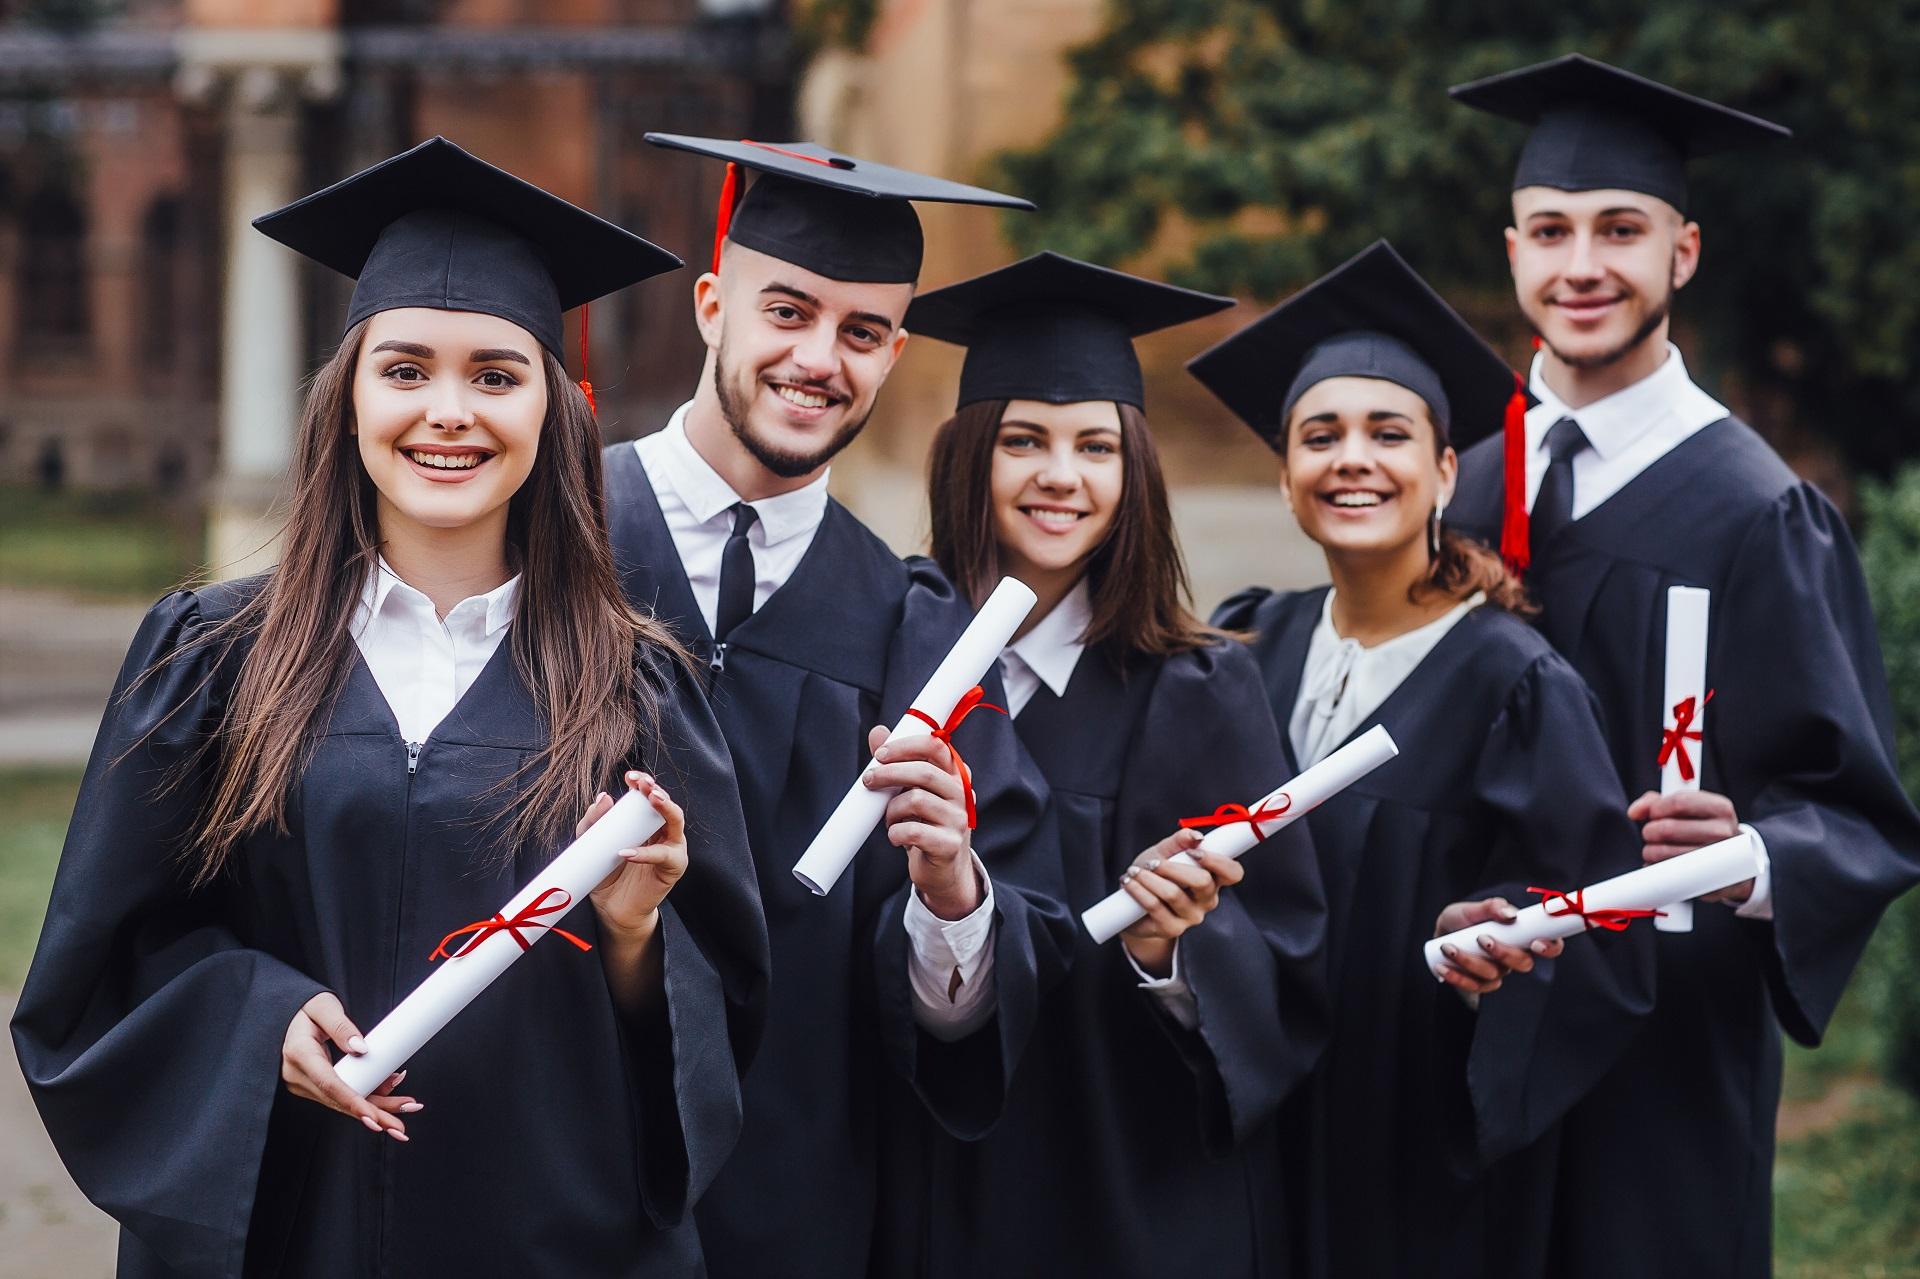 ceremonie_diplome